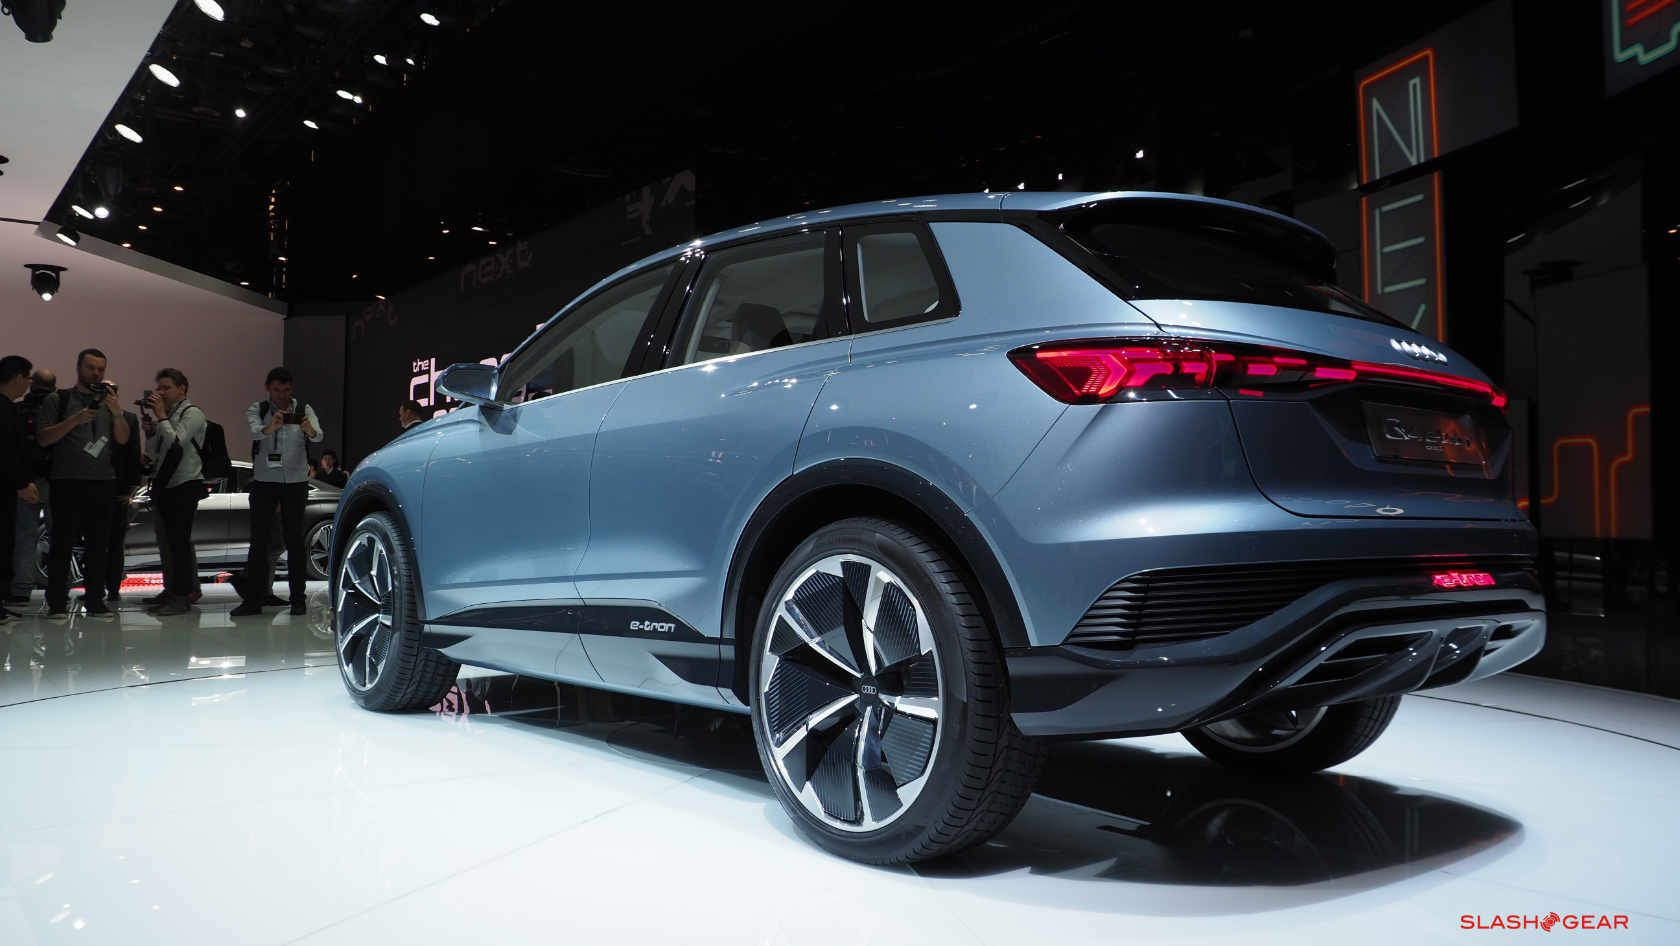 2021 Audi Q4S New Concept in 2020 Audi, New cars, Car